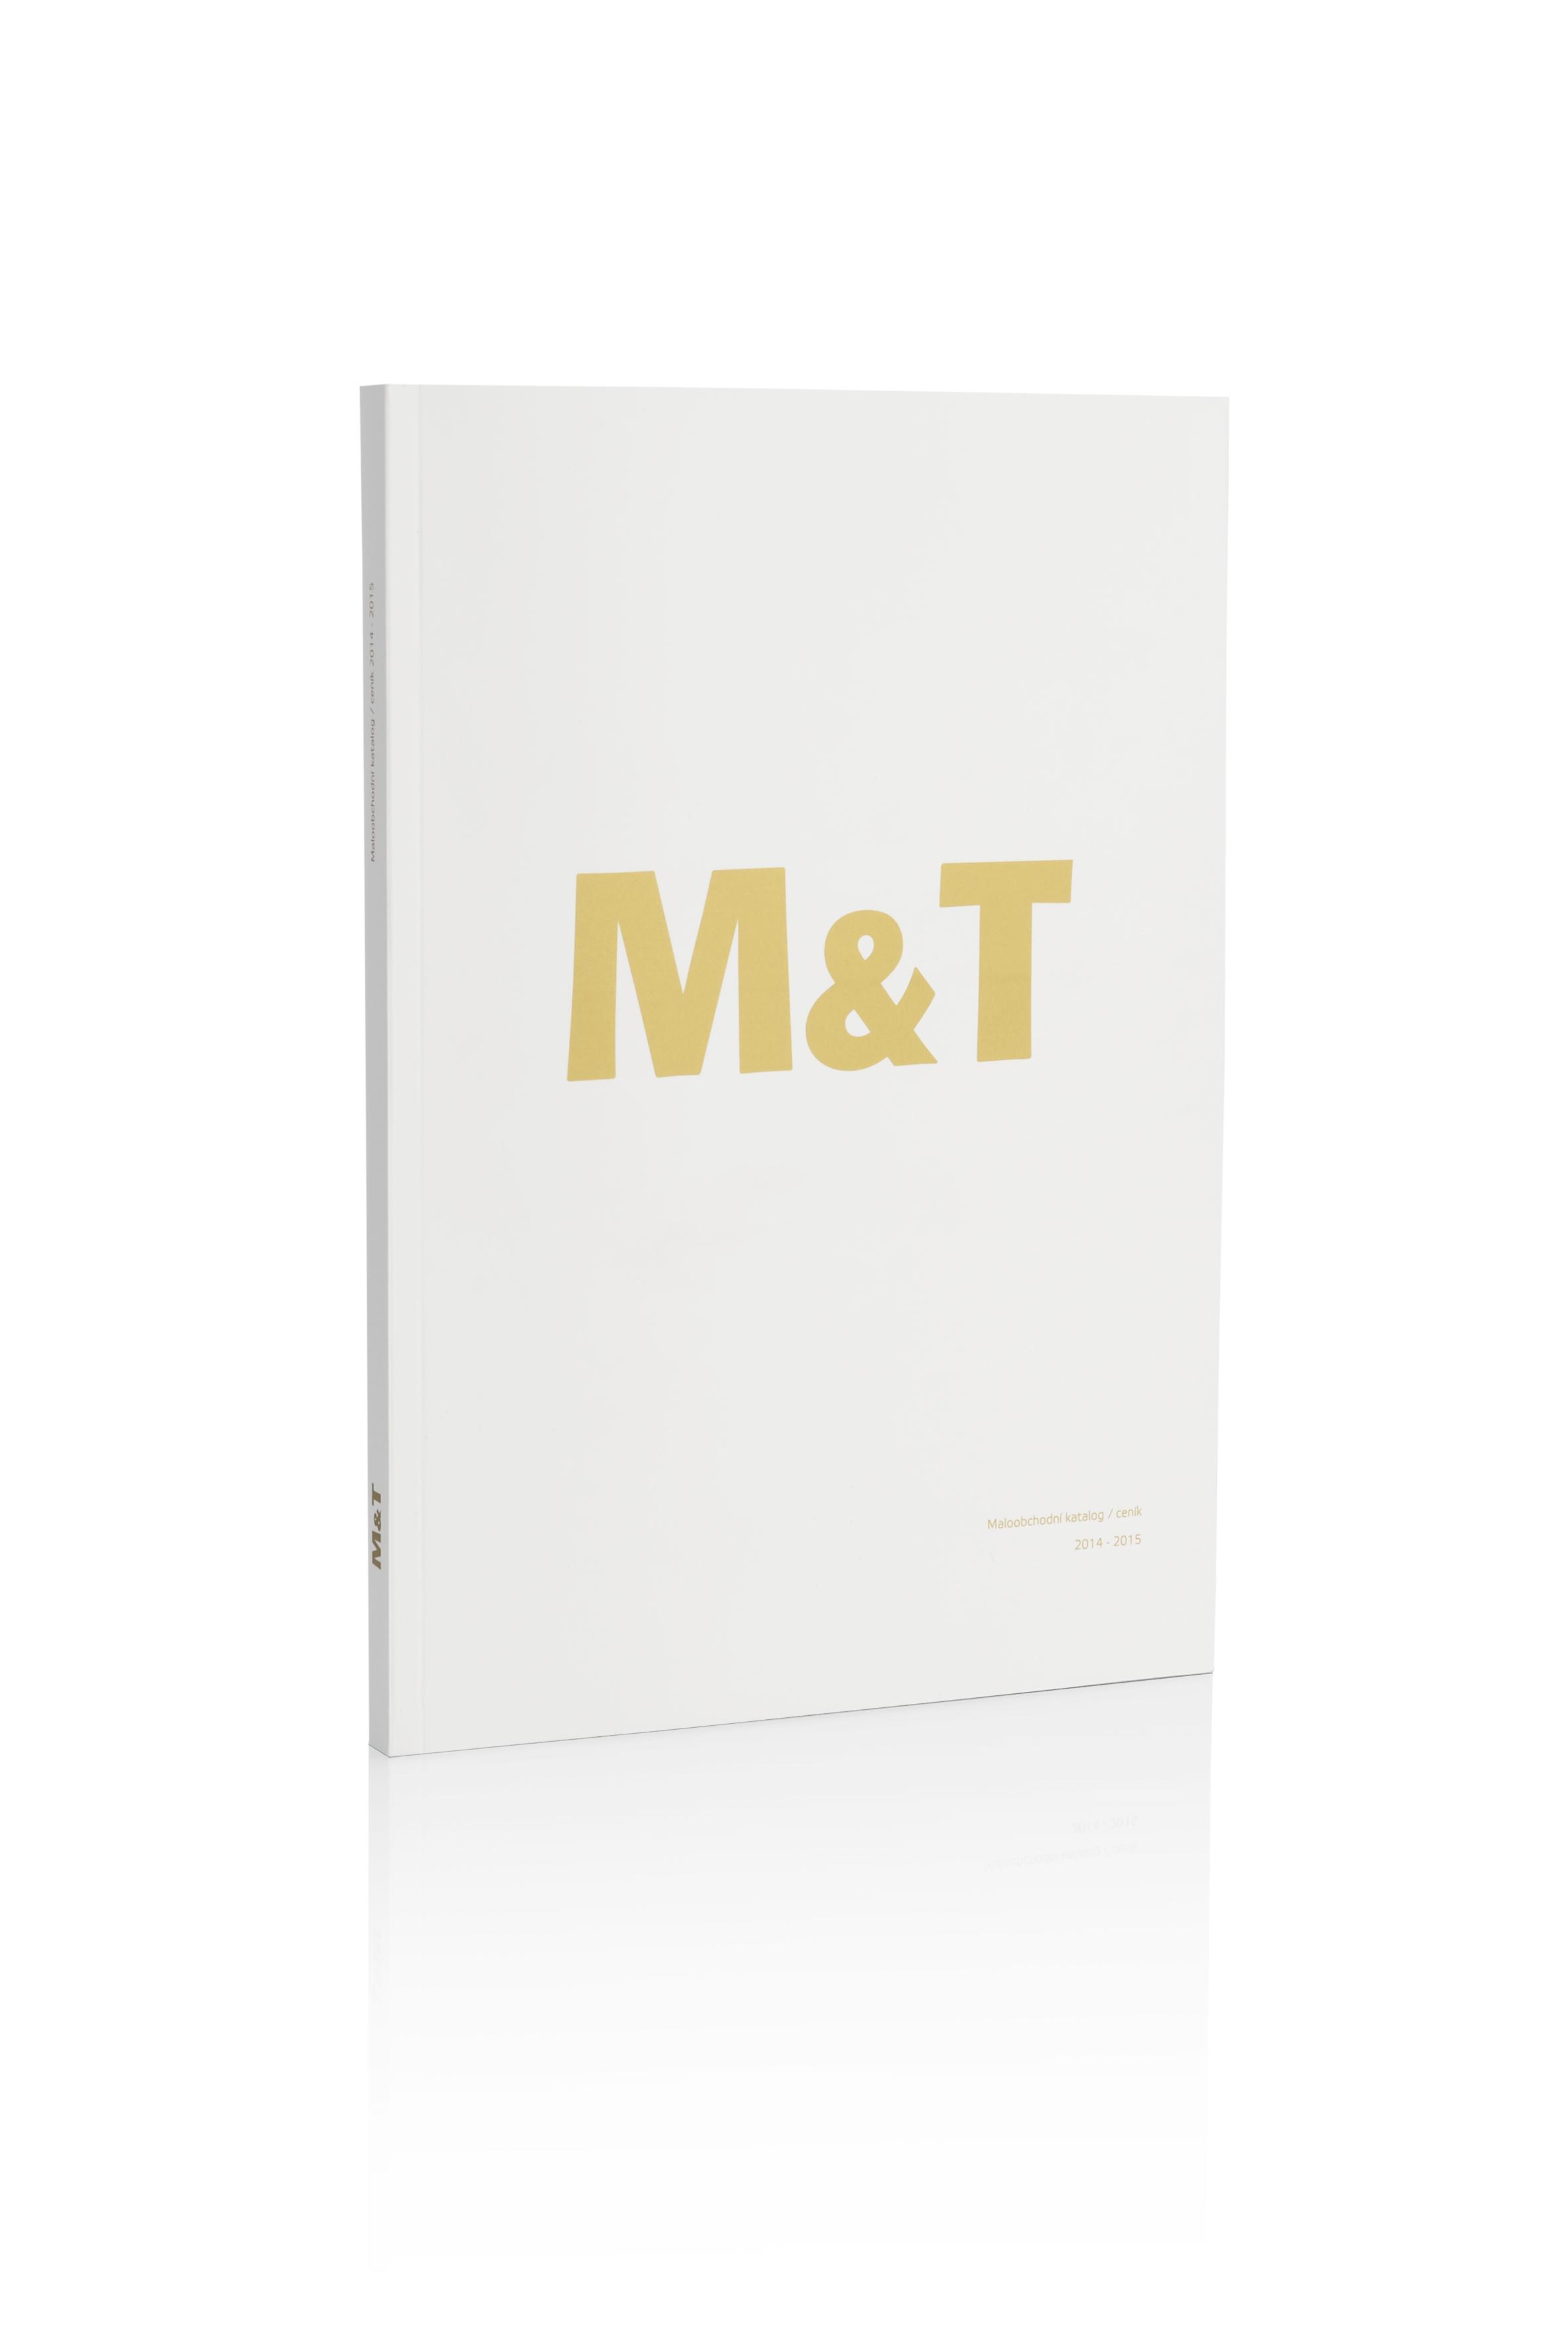 Cennik M&T